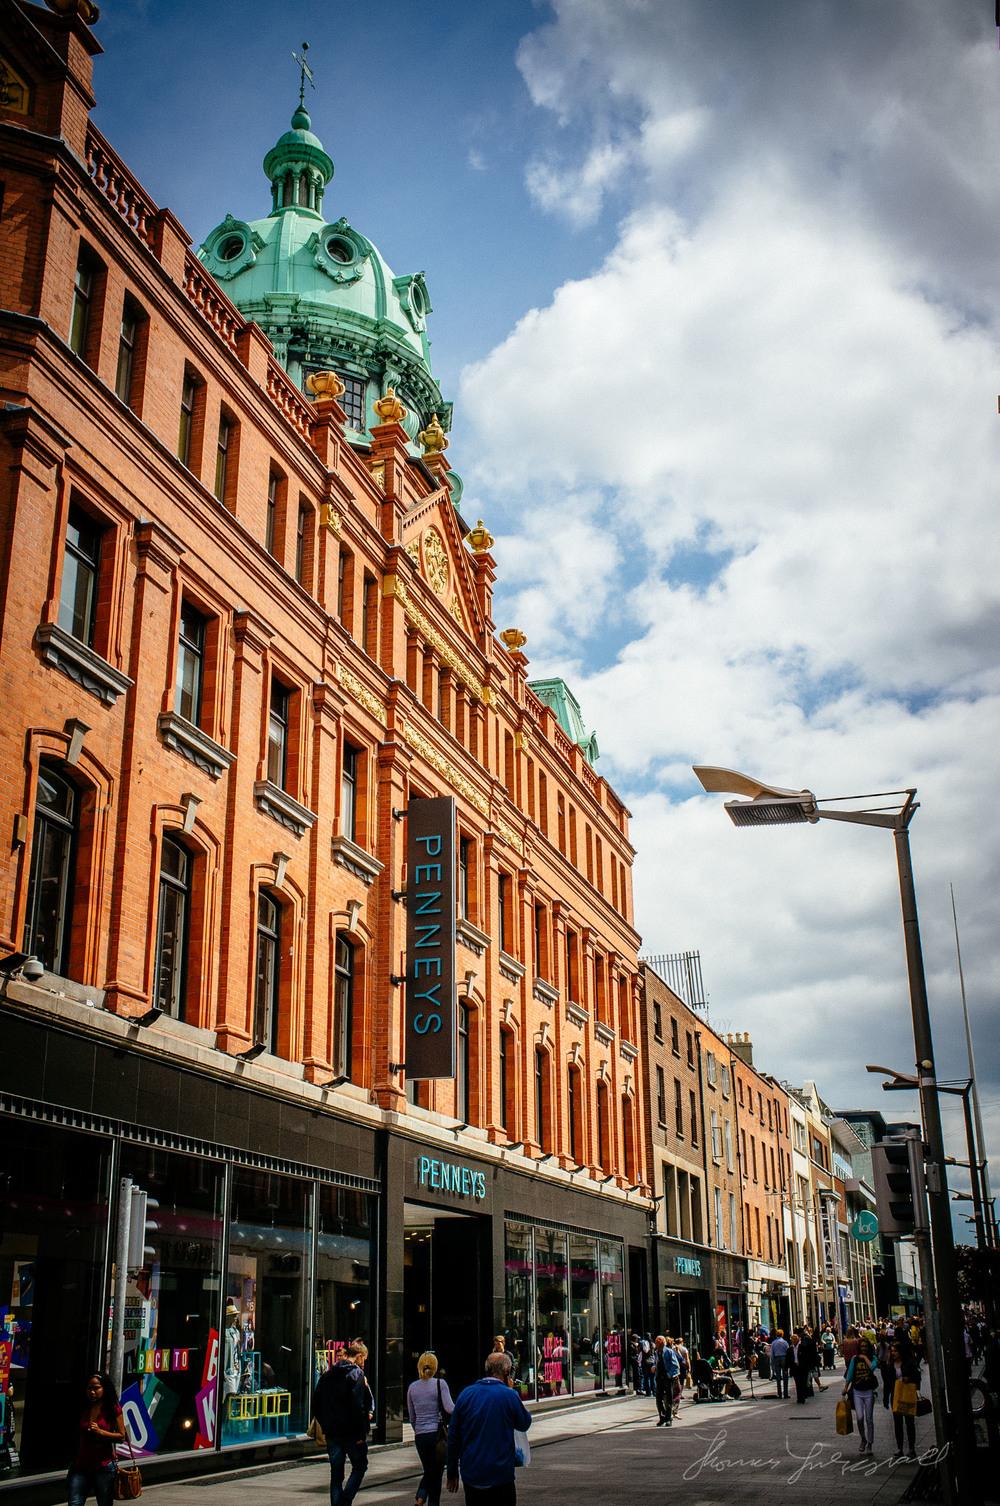 Streets-of-Dublin-Photo-8230.jpg